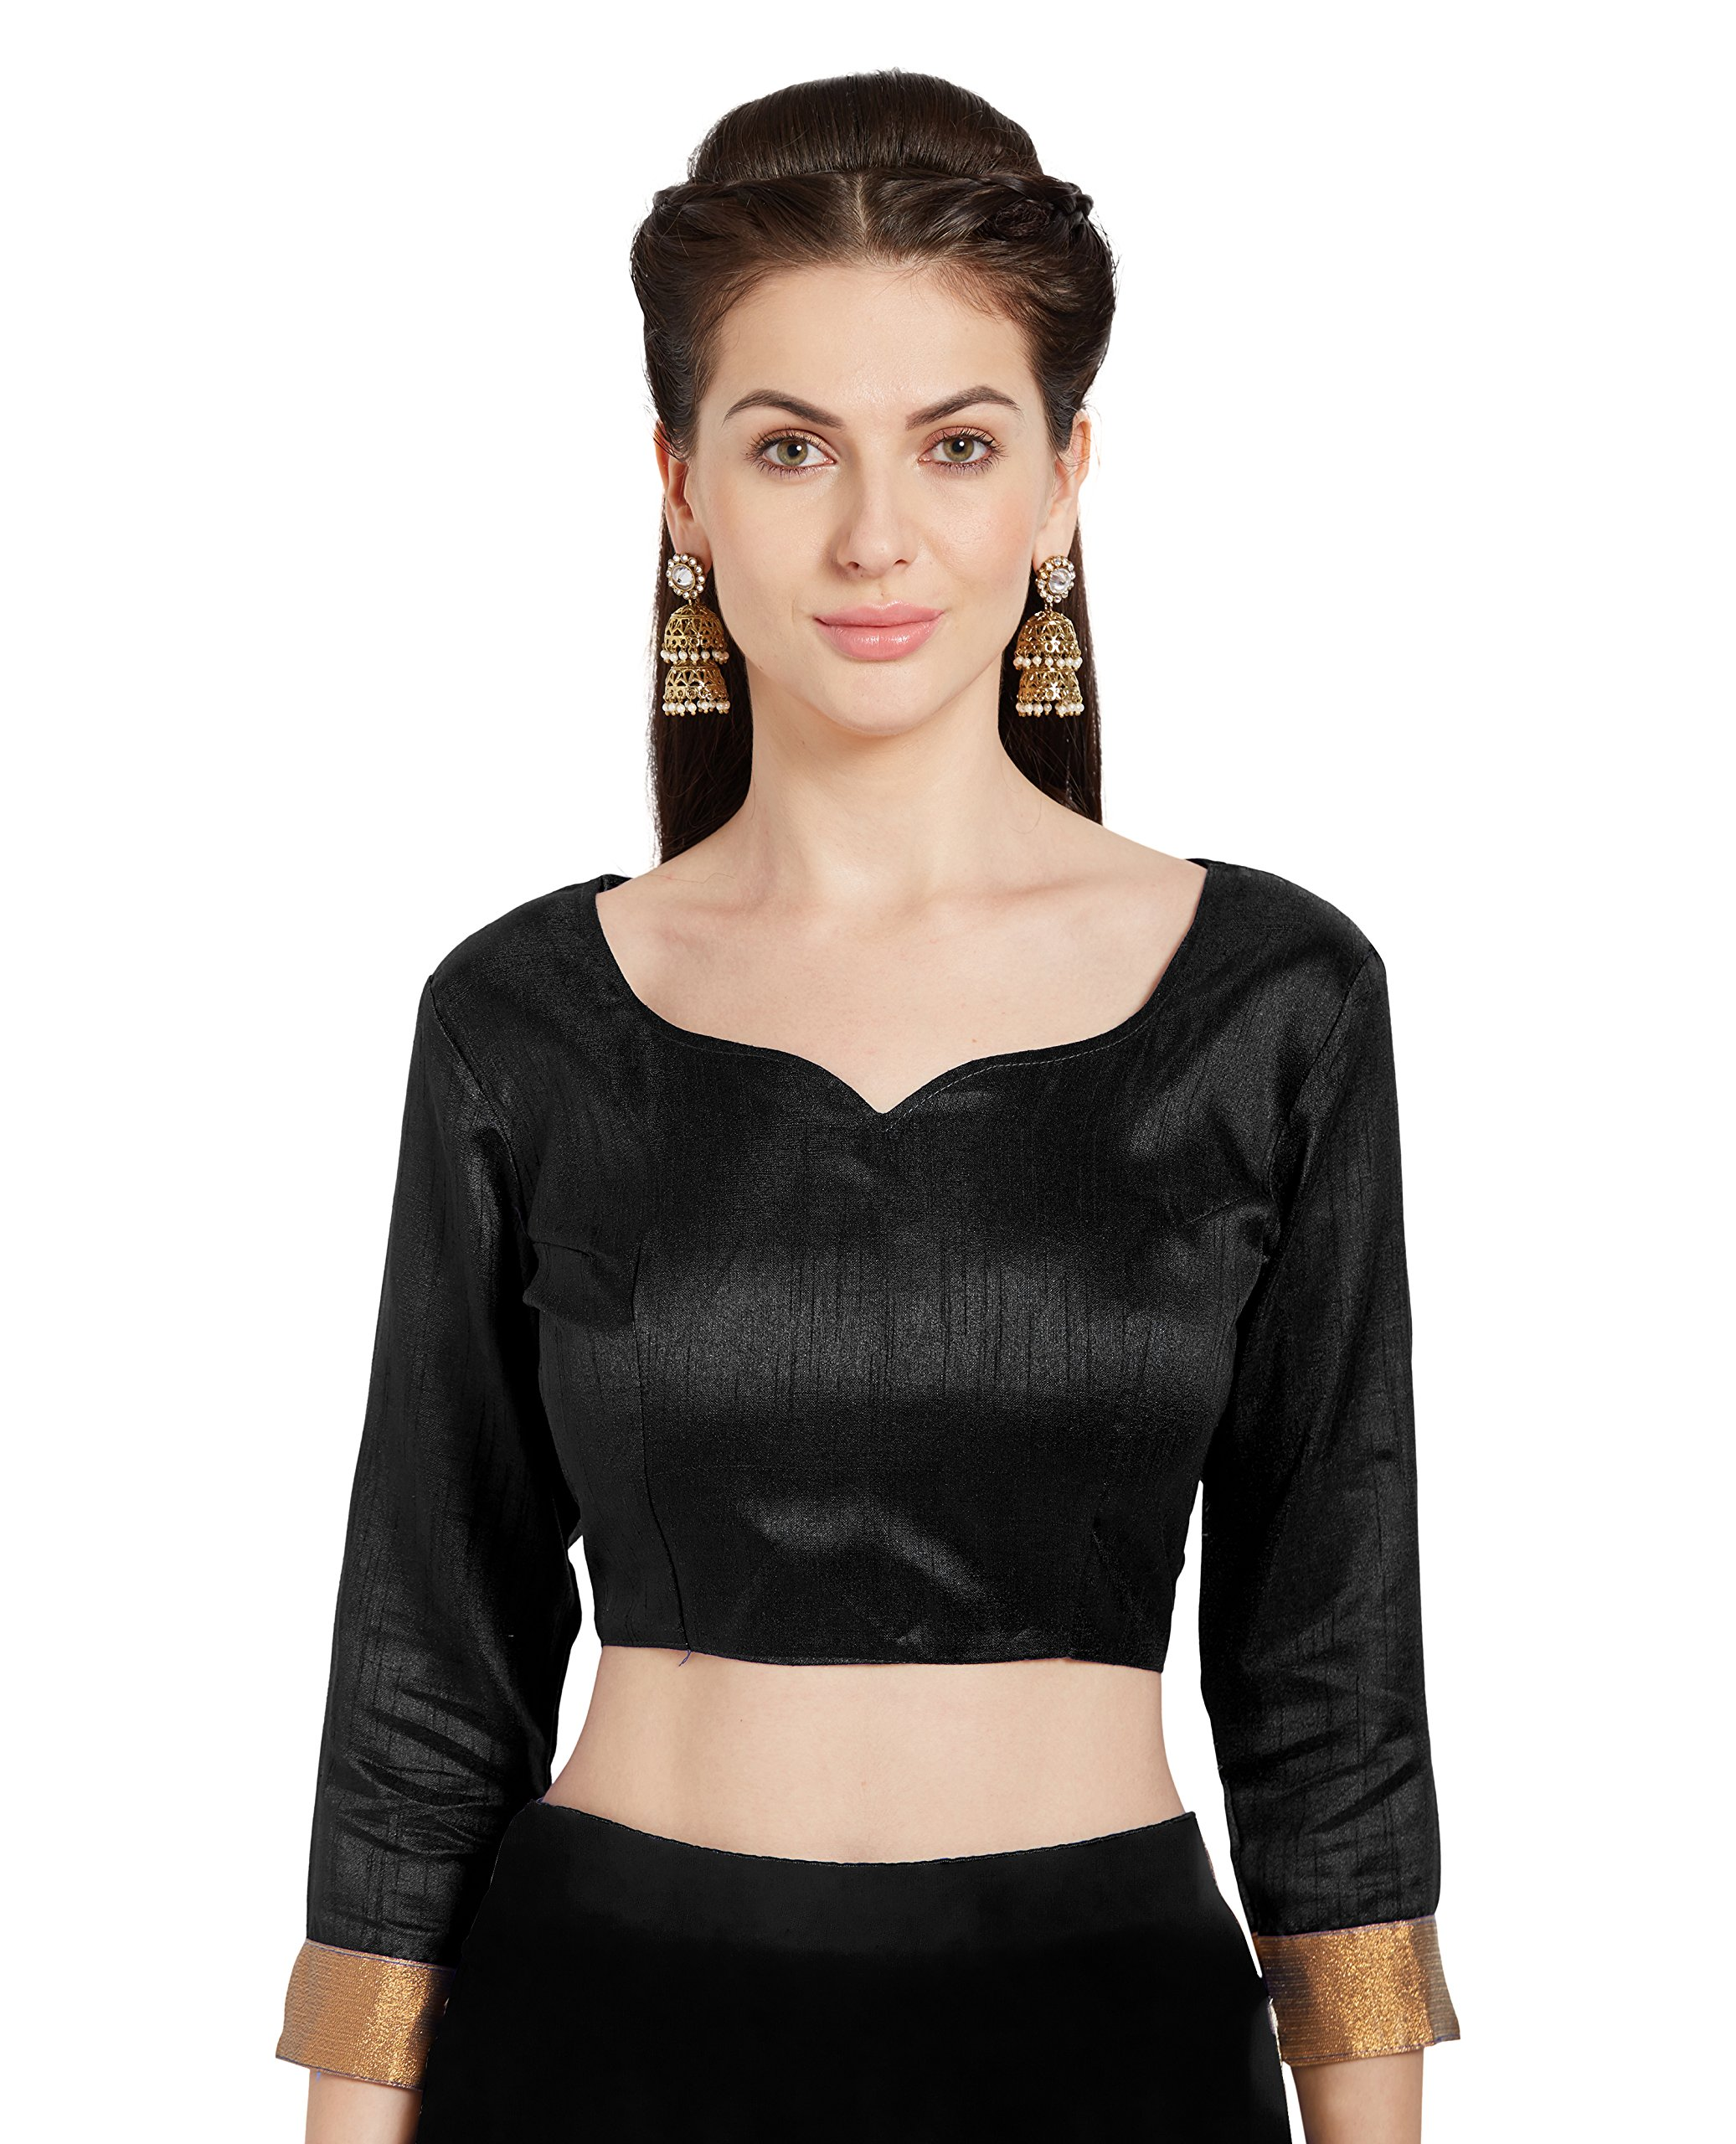 b9f0d05cd84037 Get Quotations · Women s Art Silk Readymade Saree Blouse Stylish Choli  Mirchi Fashion Top